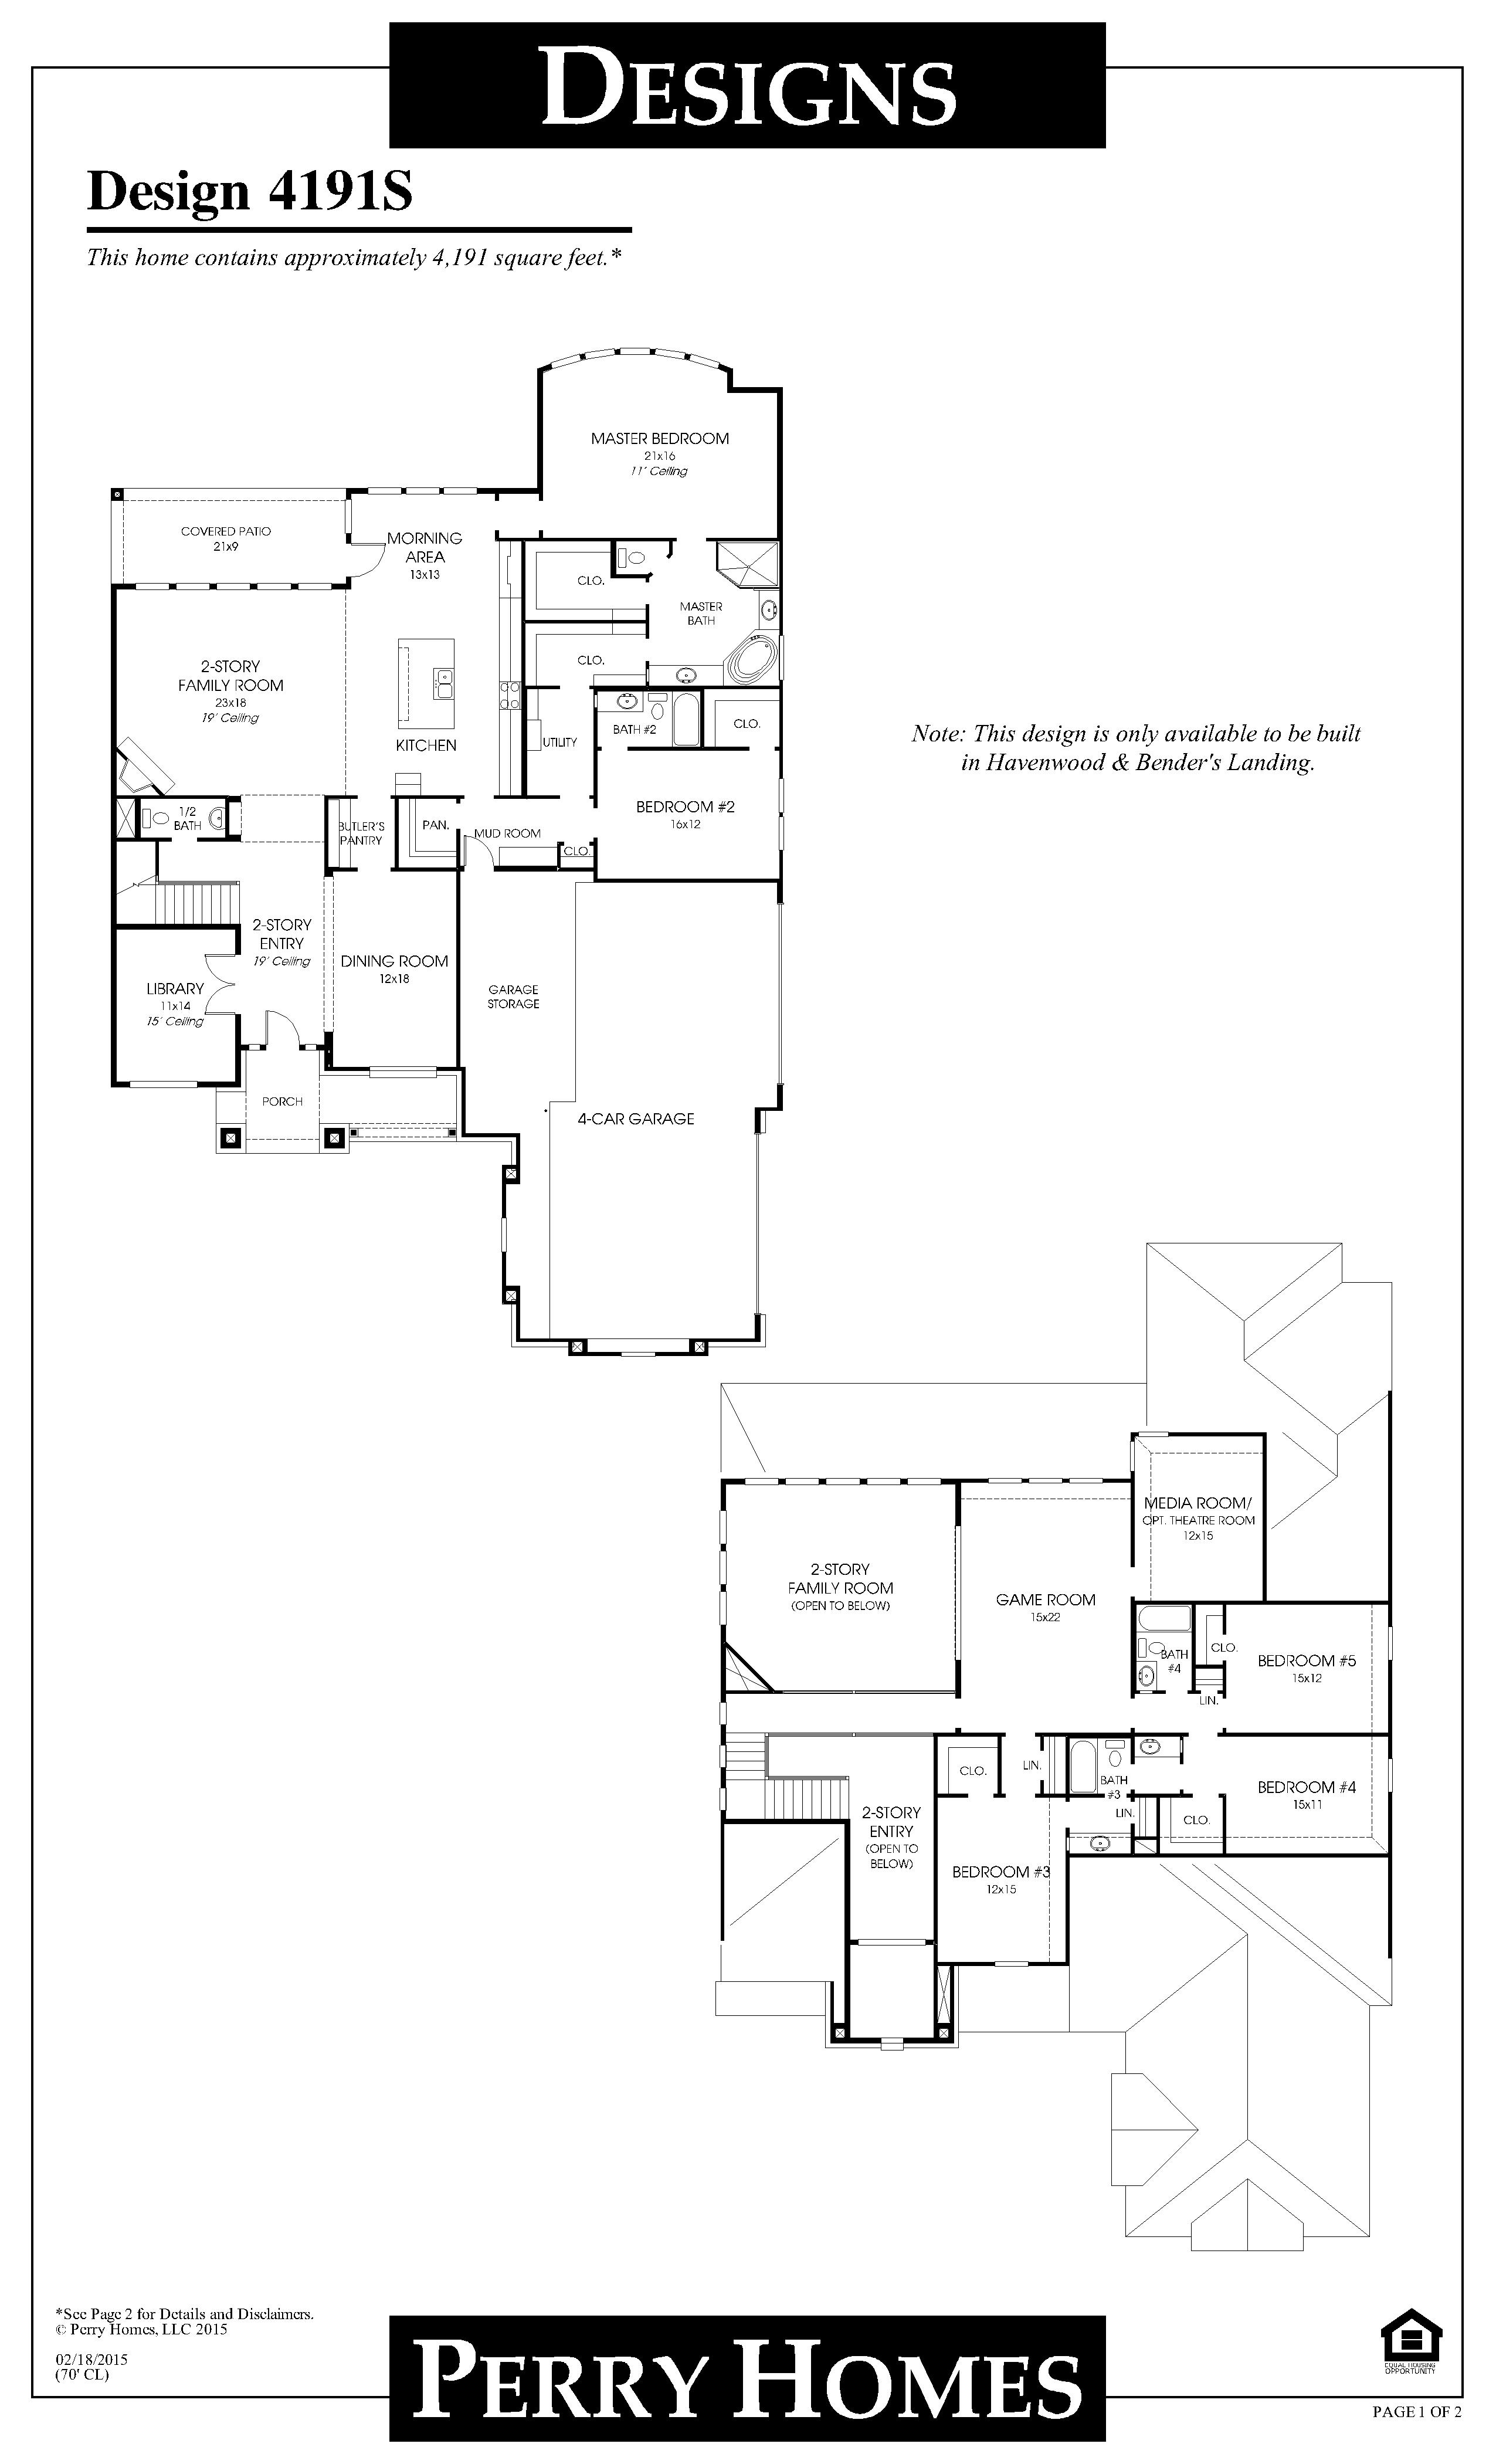 cibolo singles 341 willow, cibolo, tx 78108 5 bed, 3 bath single family home for sale.